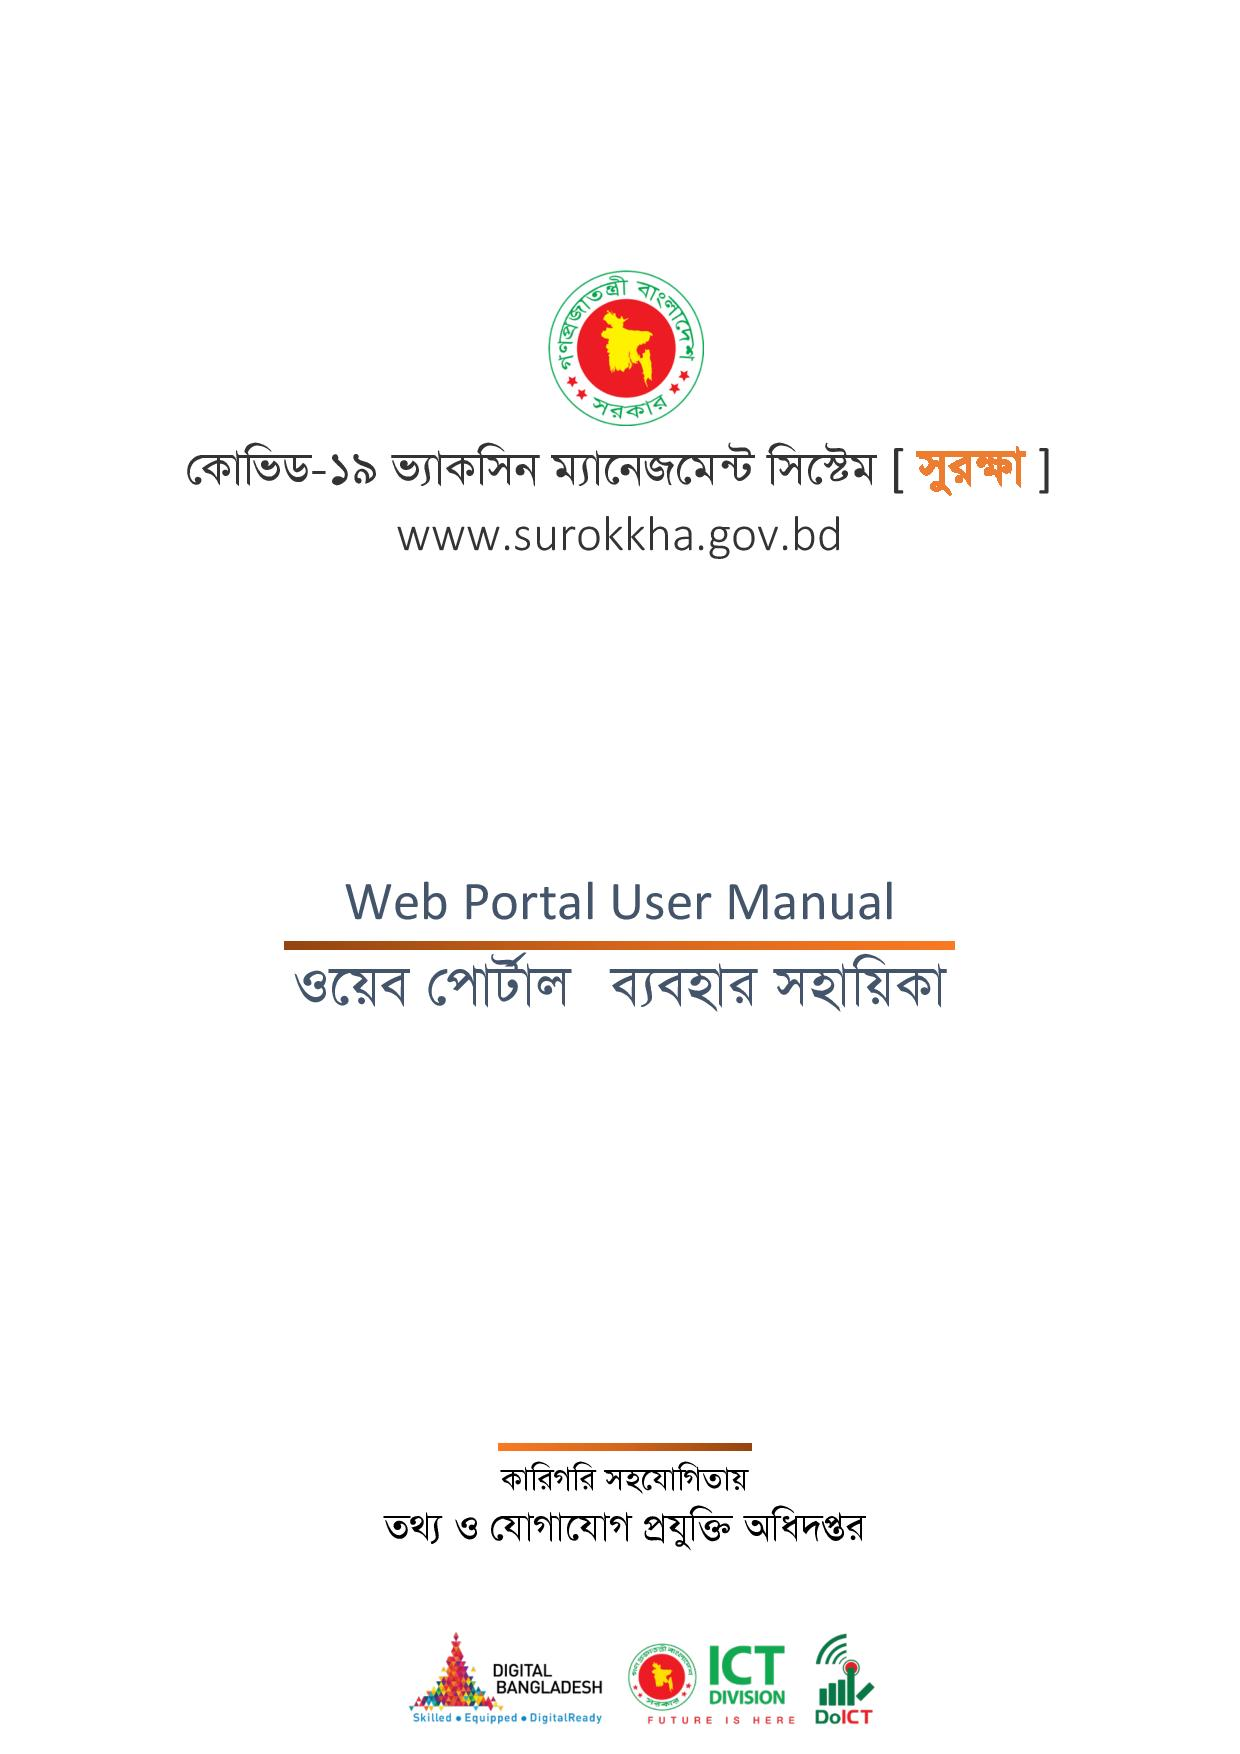 Surokkha Web Portal User Manual